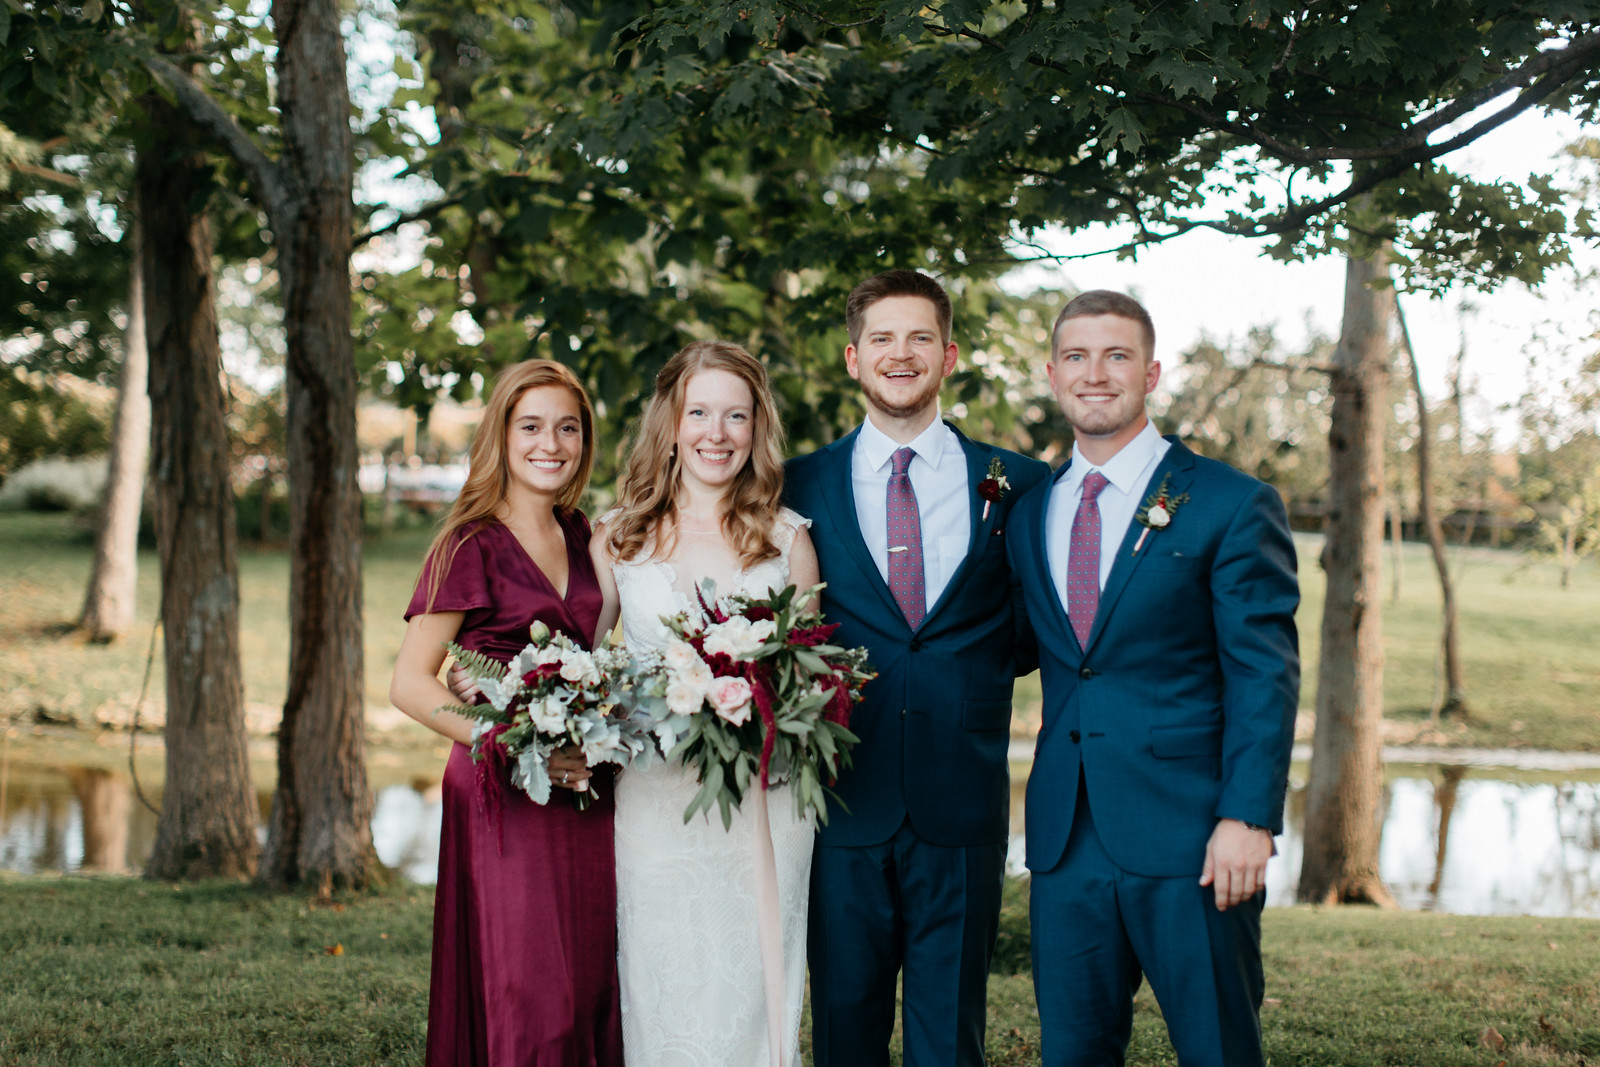 WeddingParty_011-X3.jpg